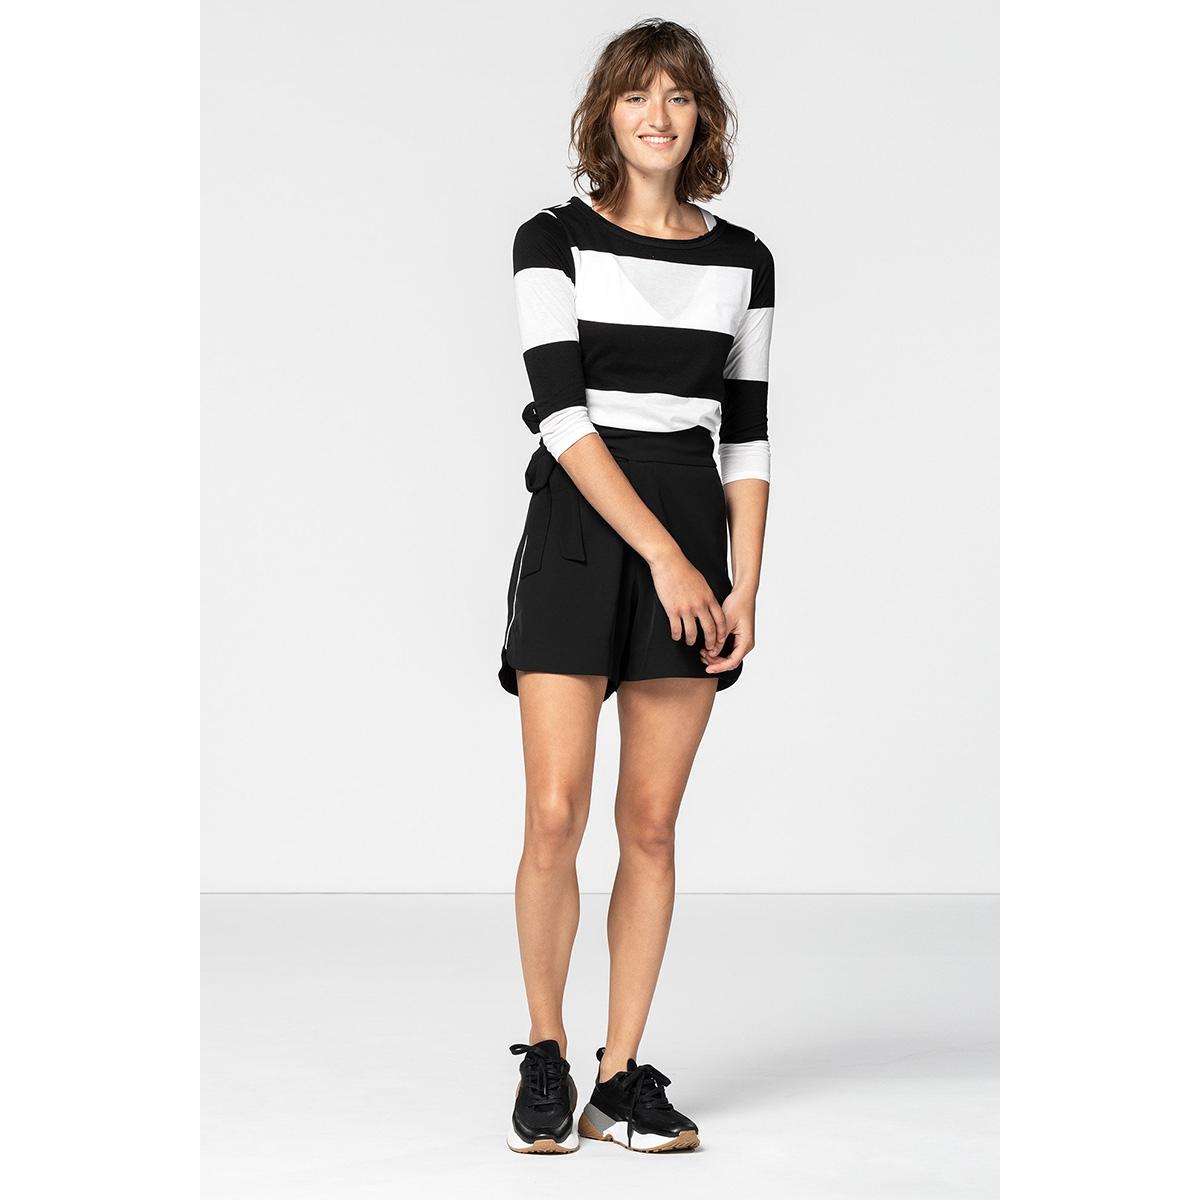 207729101 10 days t-shirt white/black